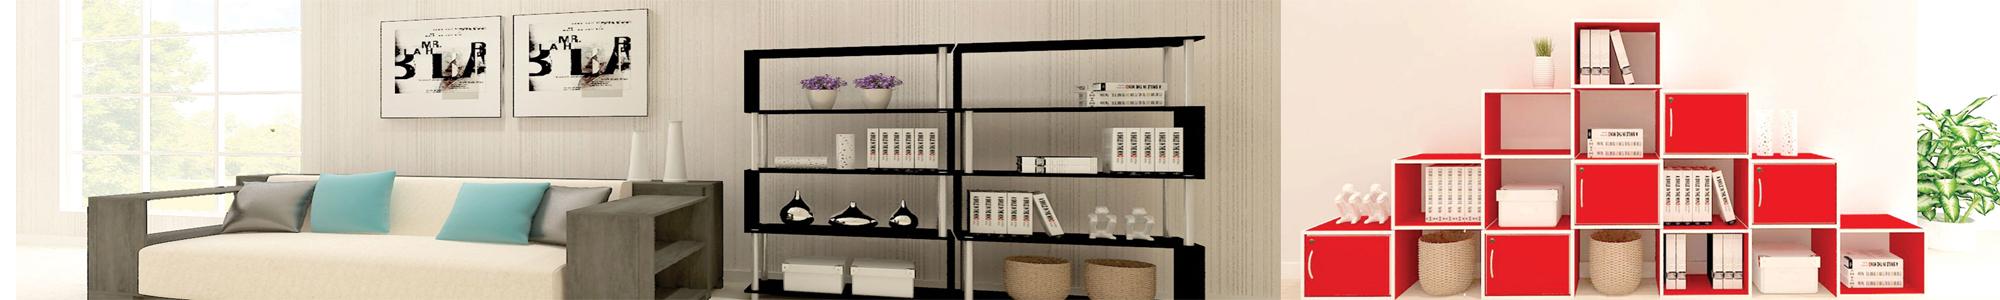 Shelves/ Cabinets